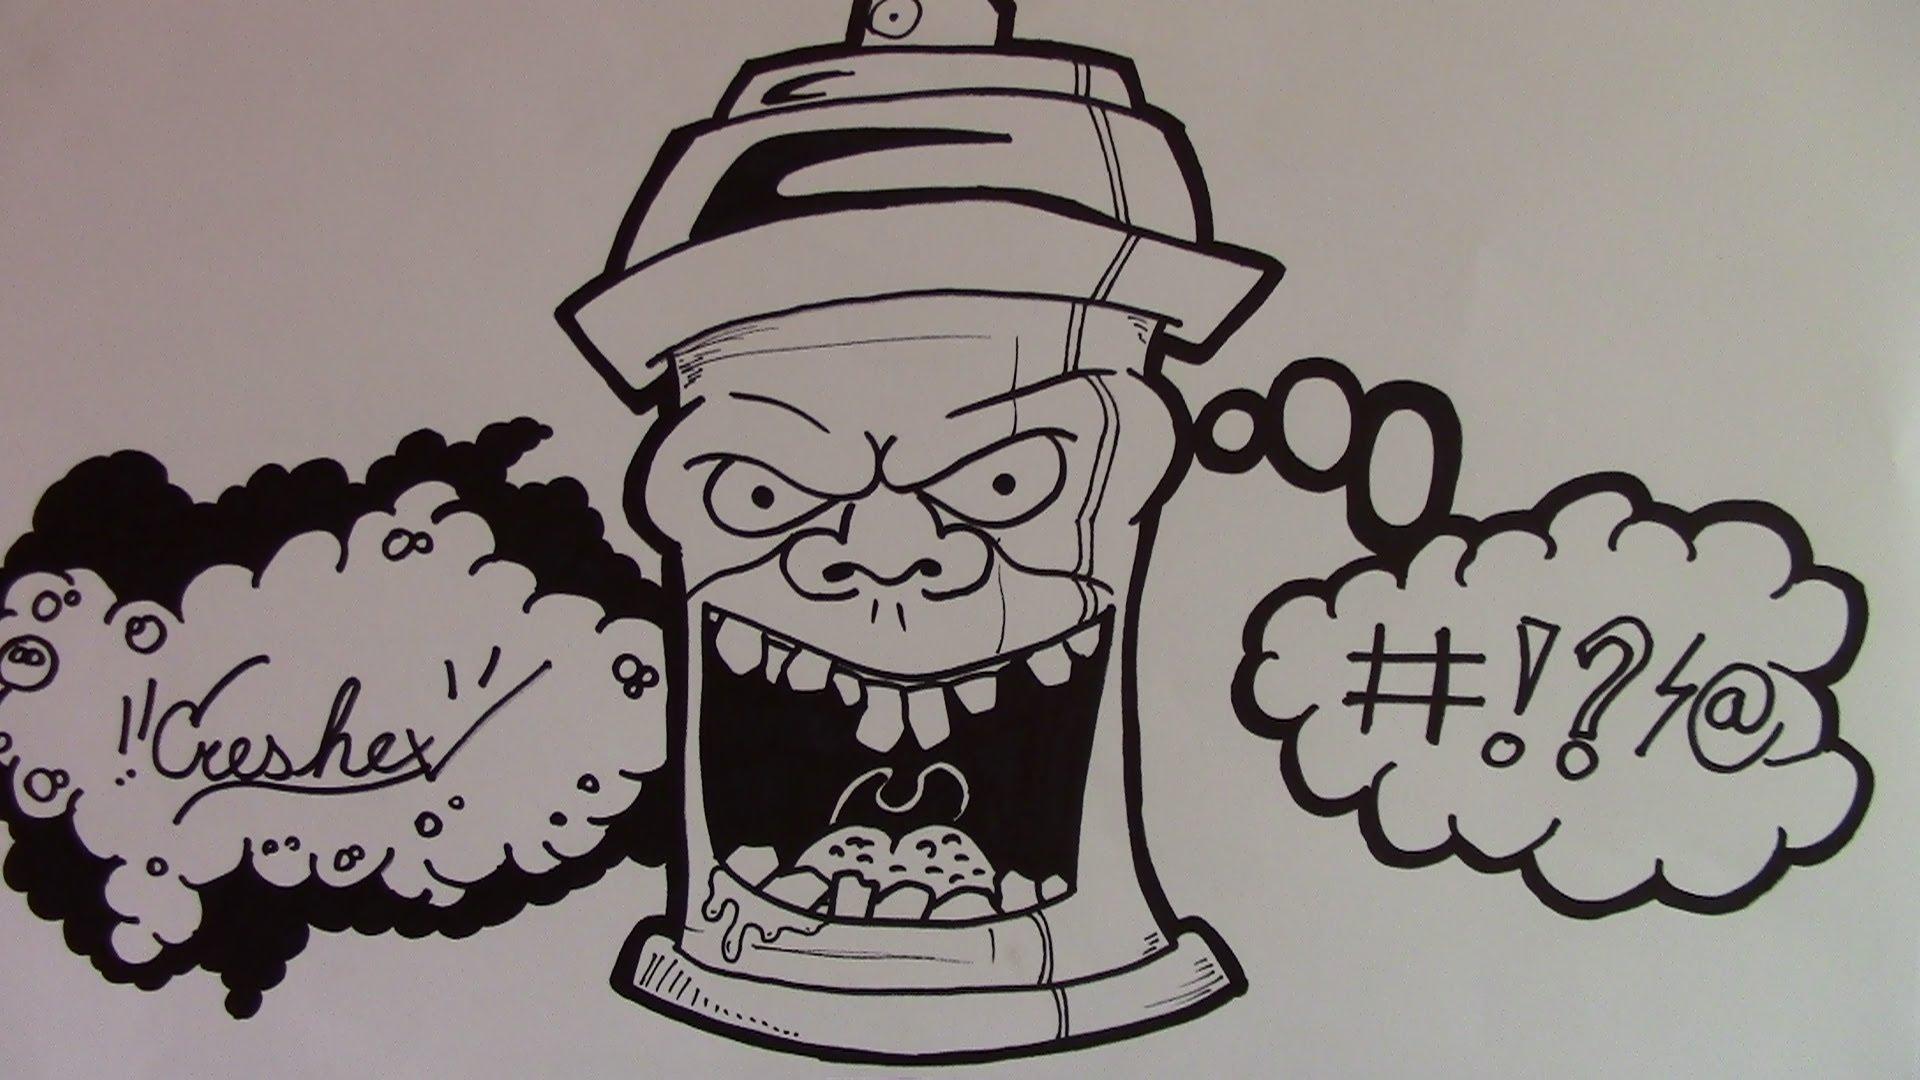 Kumpulan Gambar Sketsa Monster Sketsa Gambar